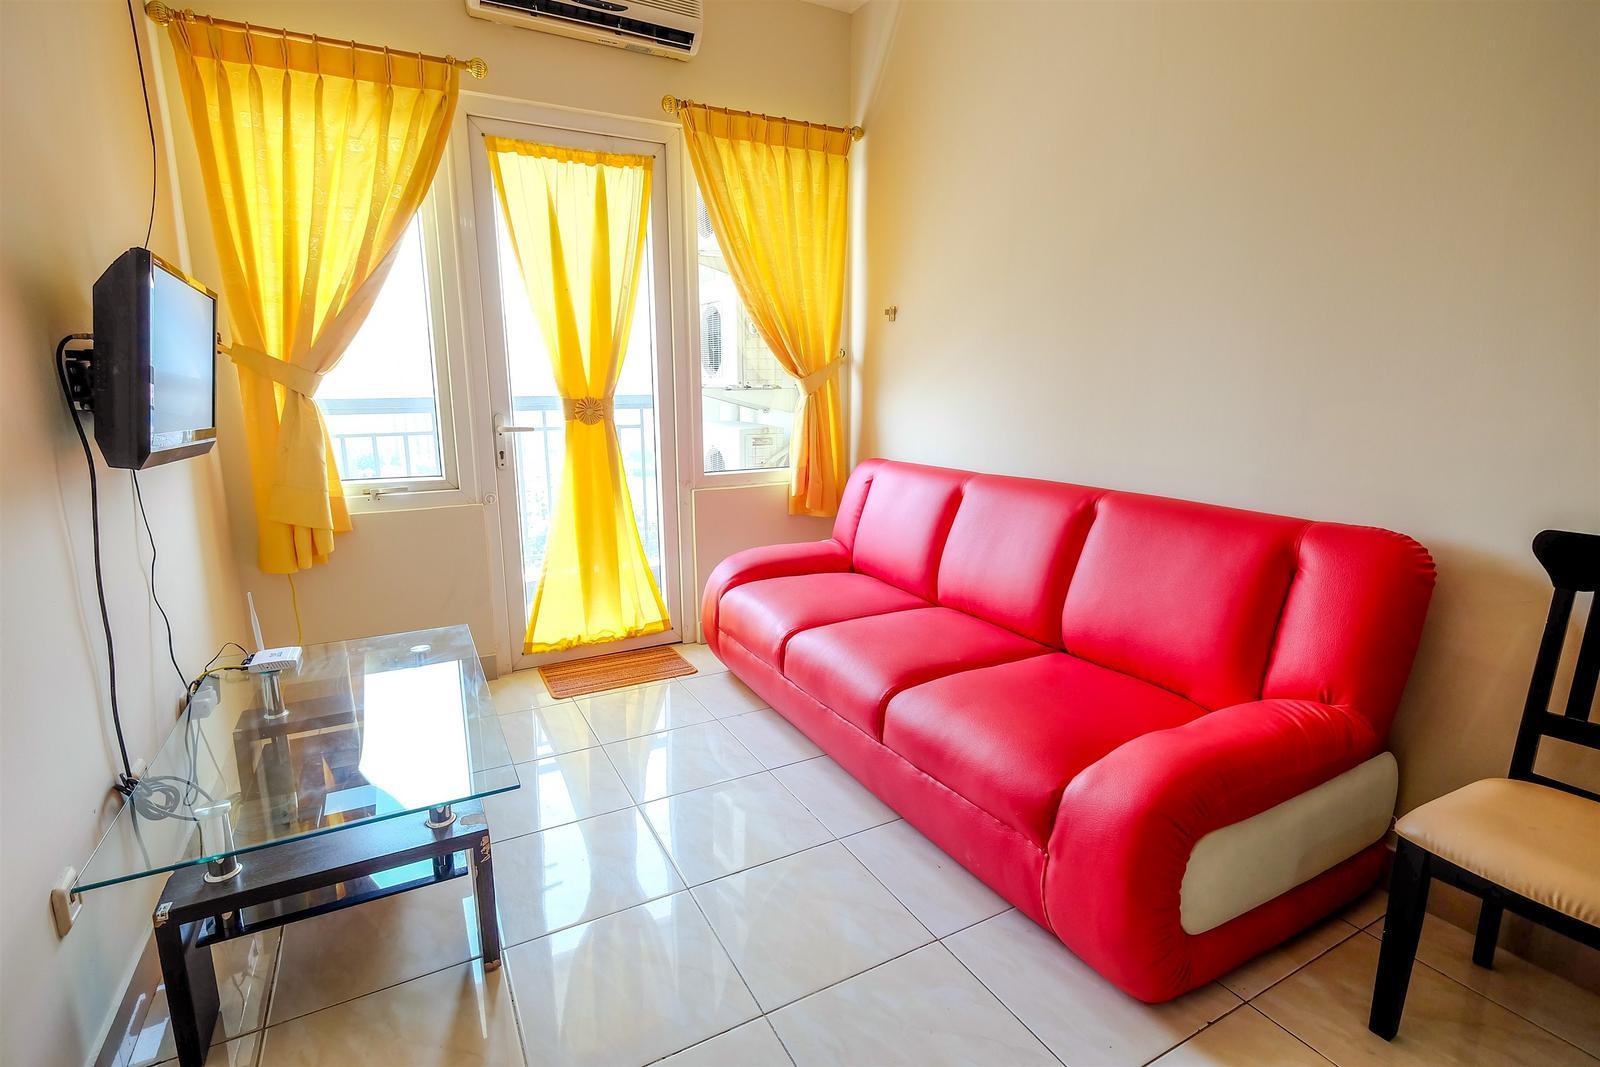 Apartemen Grand Palace Kemayoran - Simple in Style 2 BR Grand Palace Kemayoran Apartment By Travelio